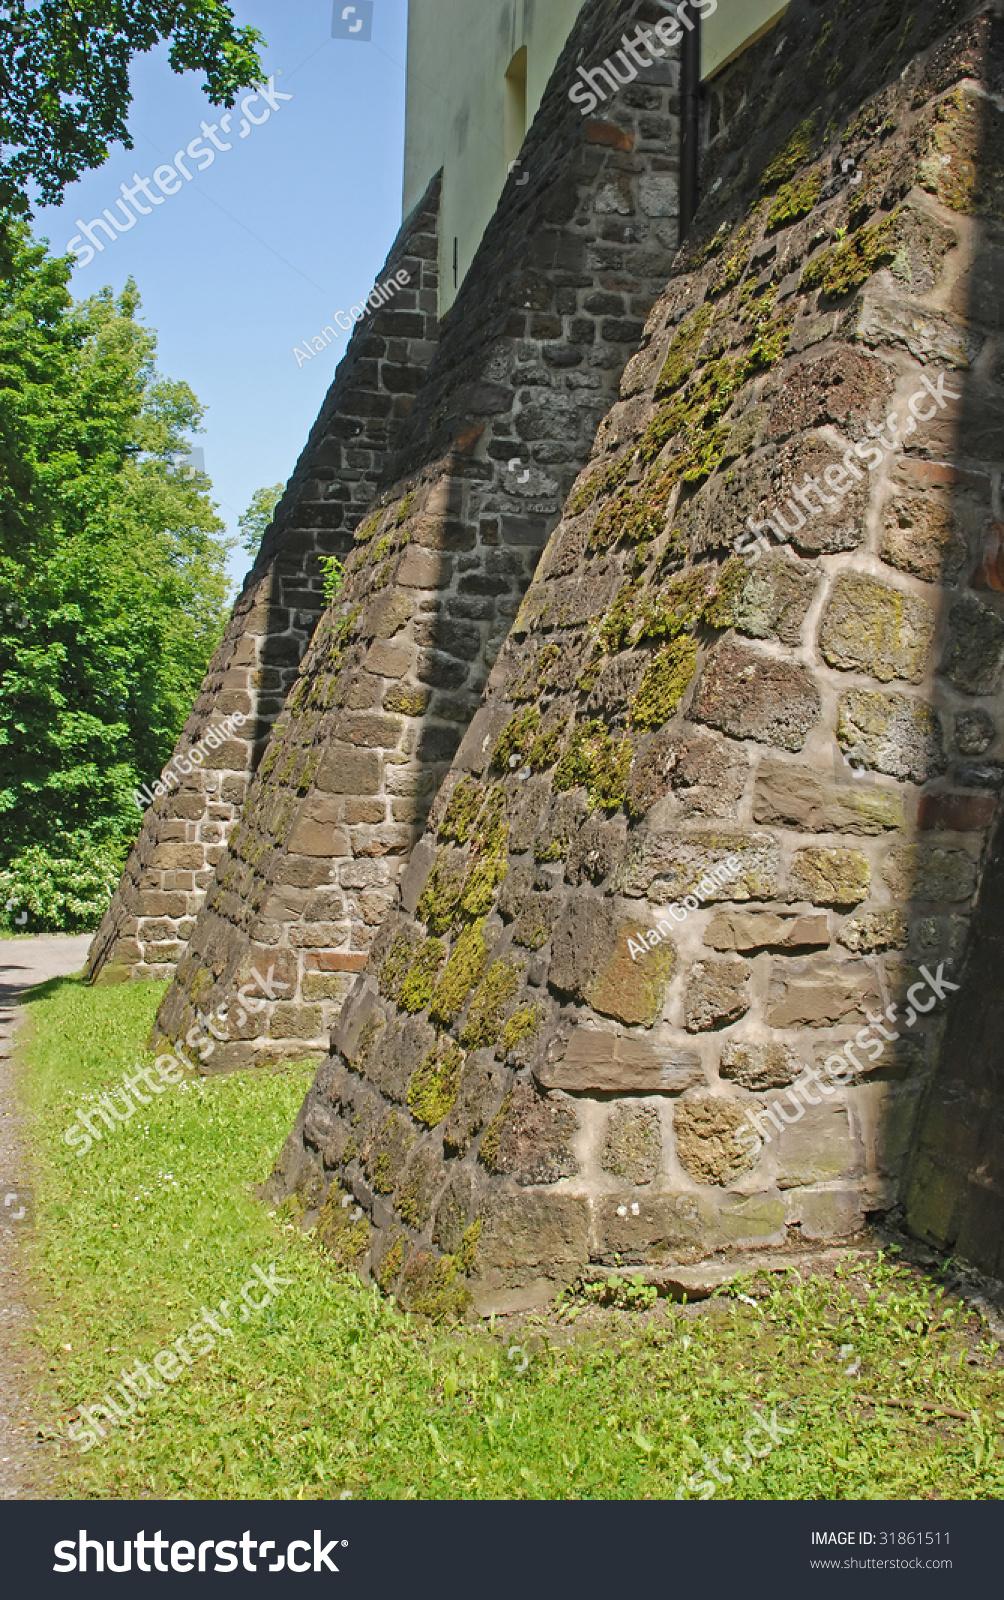 Stone Buttress Wall Stock Photo 31861511  Shutterstock